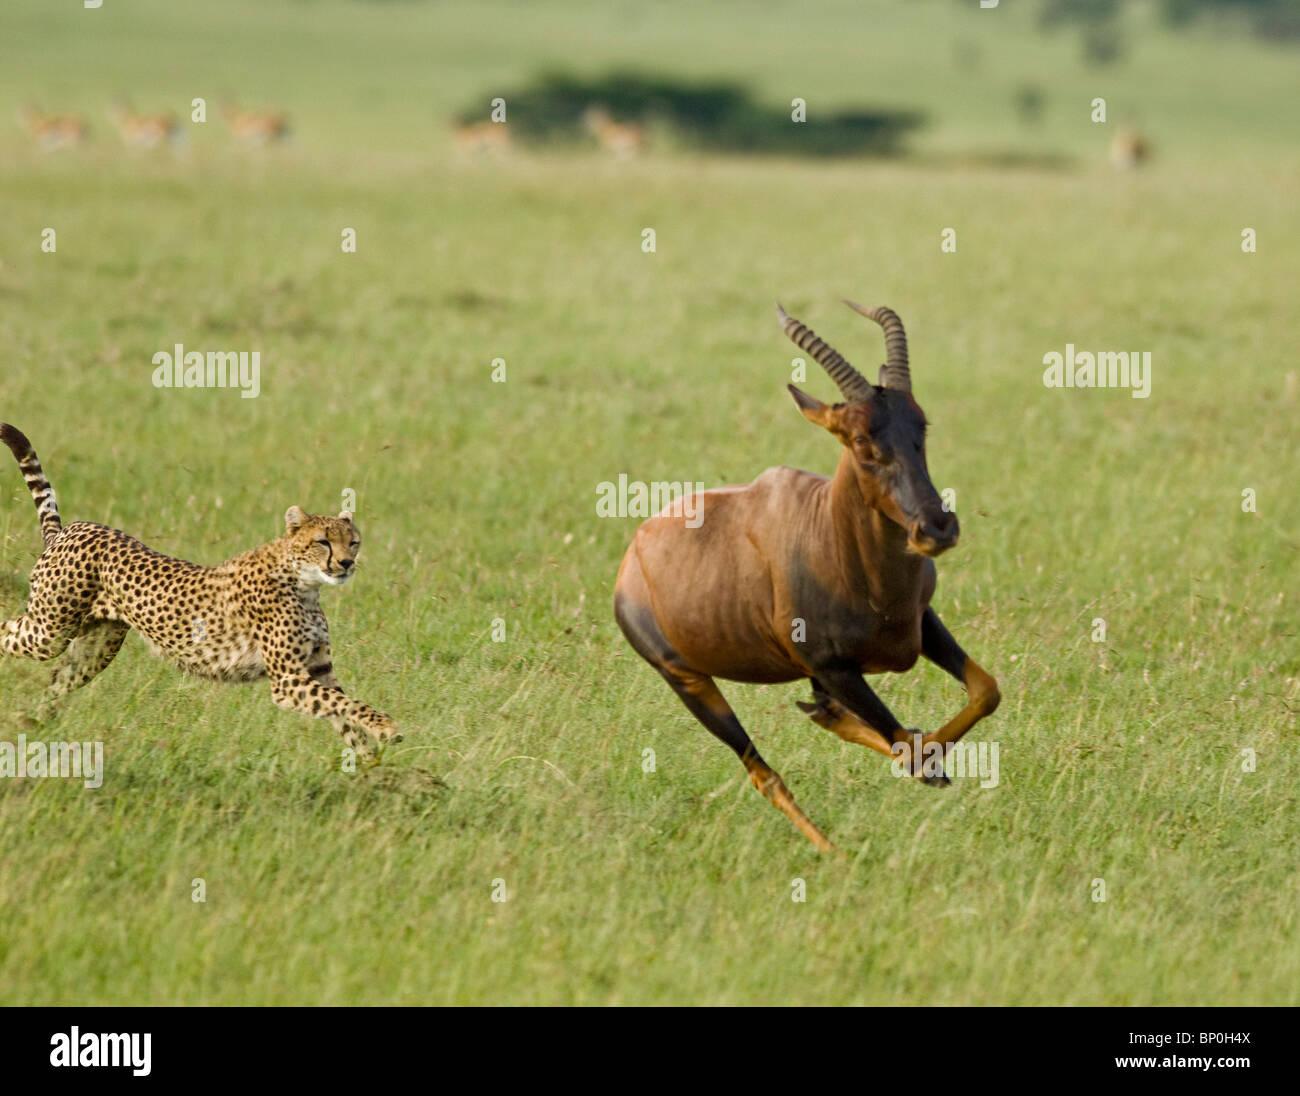 Kenya, Masai Mara. A female cheetah hunts a topi in the short grass plains. - Stock Image